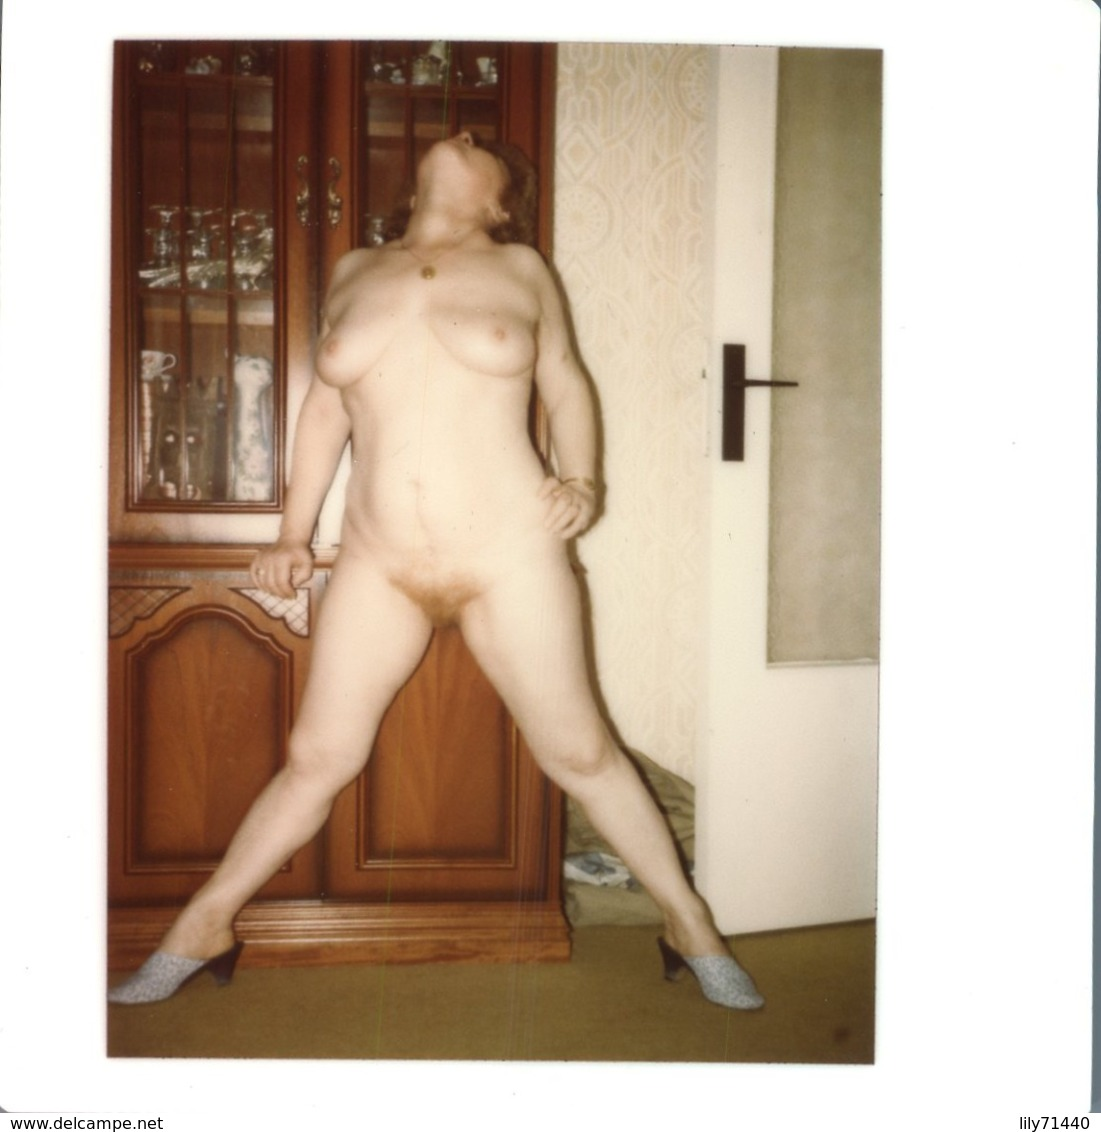 PHOTO ORIGINALE AMATEUR POLAROID FEMME NU EROTISME EROTICISM NAKED WOMAN FEMME SEINS NUS NUDE BAS CURIOSA - Belleza Feminina (1941-1960)